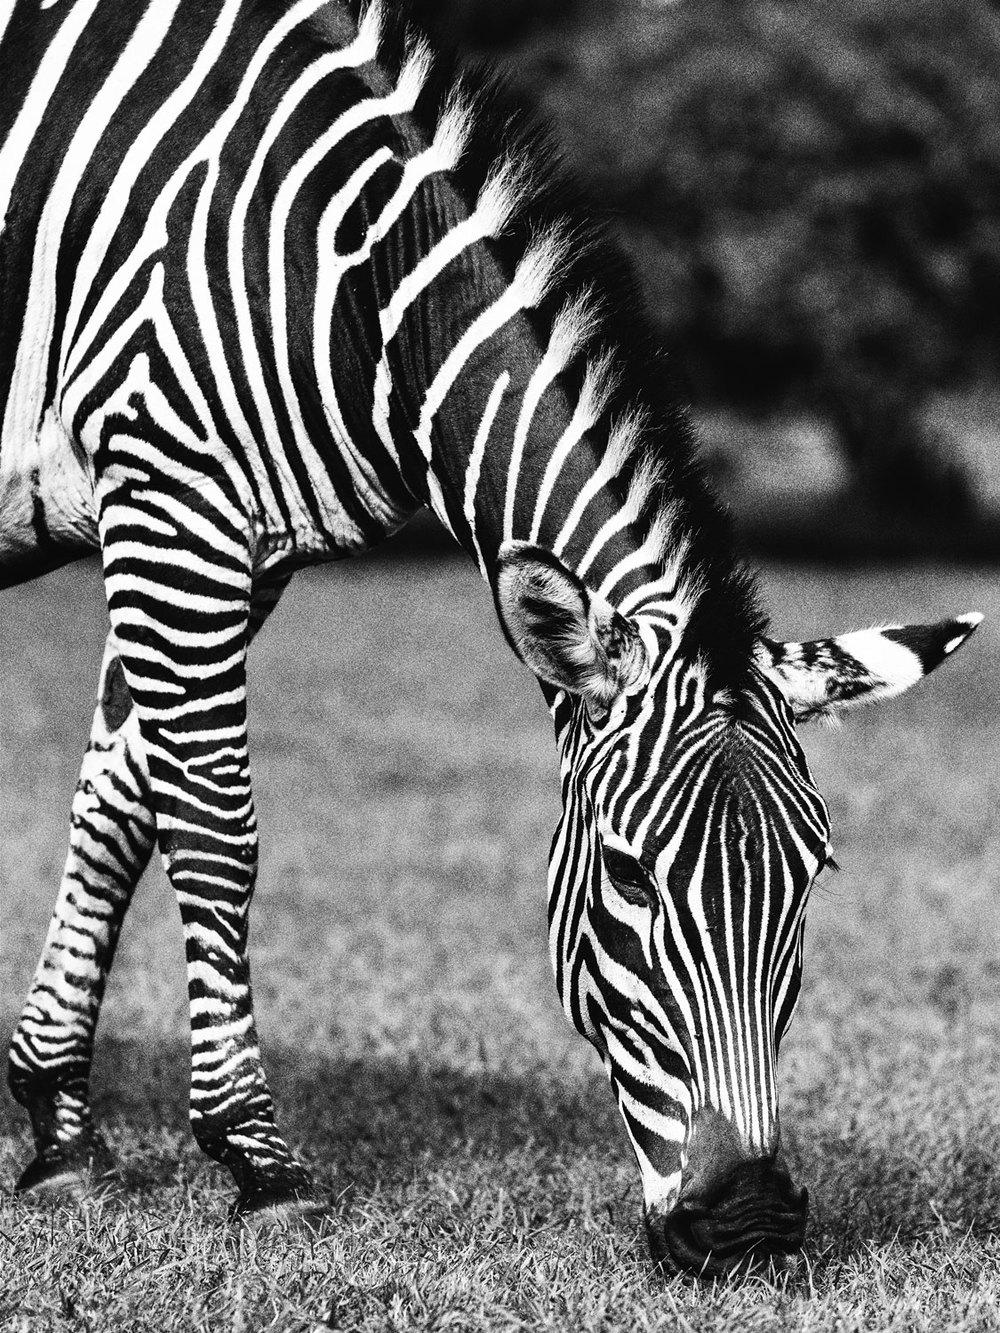 CallieGiovanna_Africa_Zambia_Eureka_20150101_05498.jpg